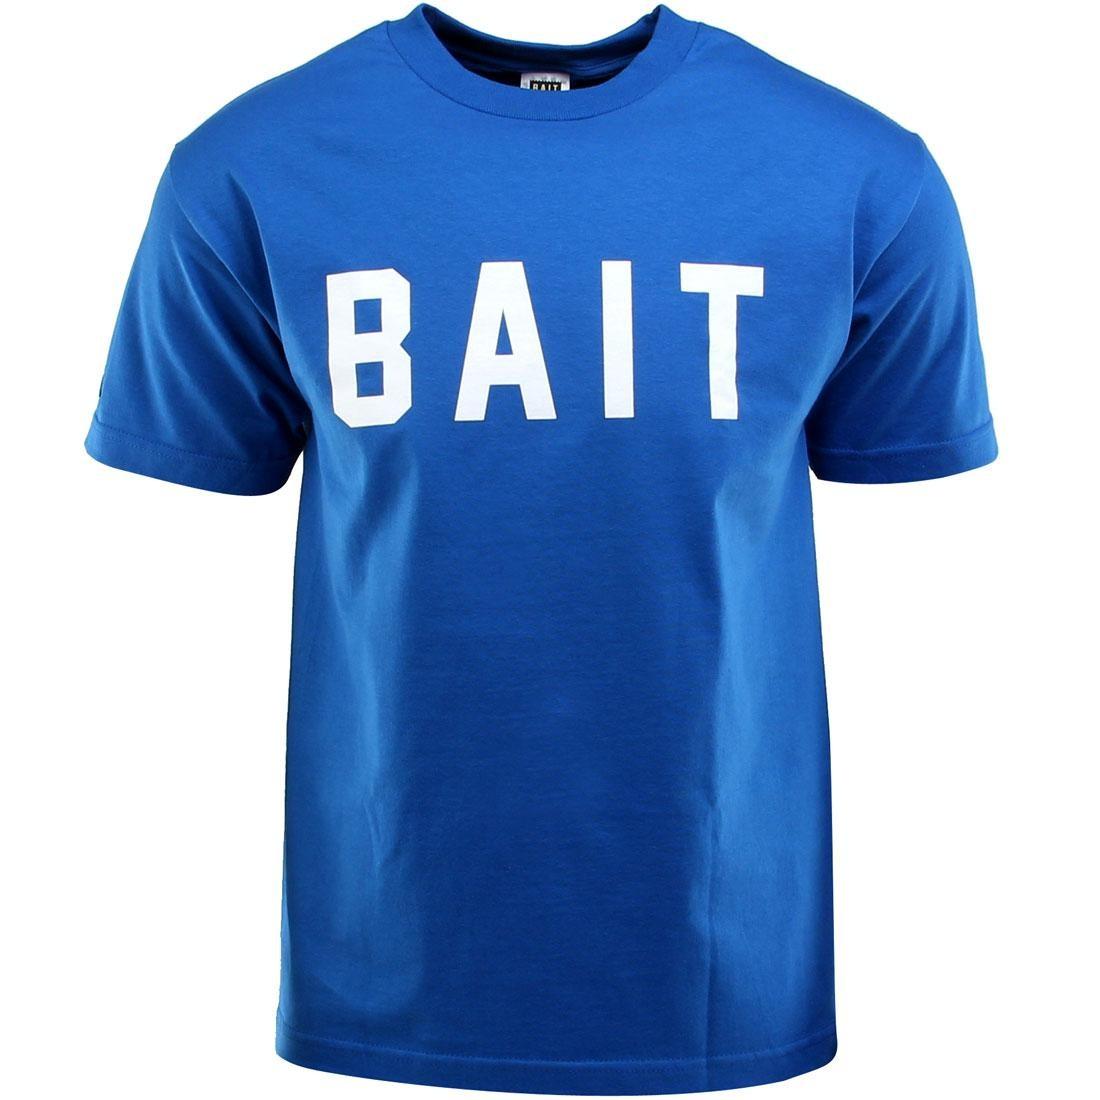 BAIT Logo Tee (blue / royal blue / white)